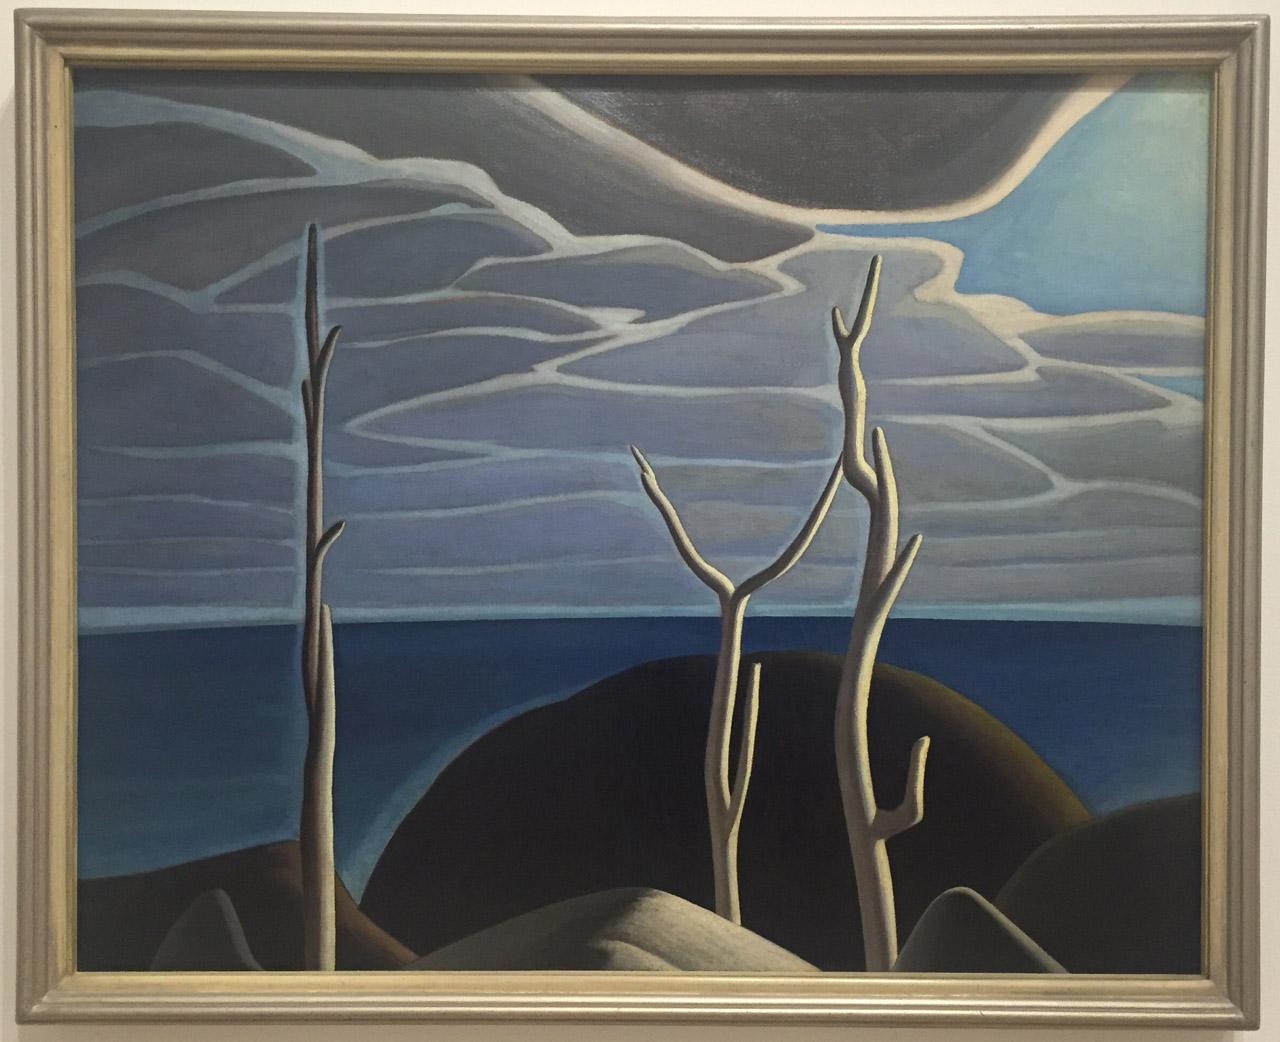 "Lawren Harris, ""Lake Superior"" (c. 1924), oil on canvas. 40 1/16 x 50 1/8 in (101.7 x 127.3 cm), Art Gallery of Ontario"